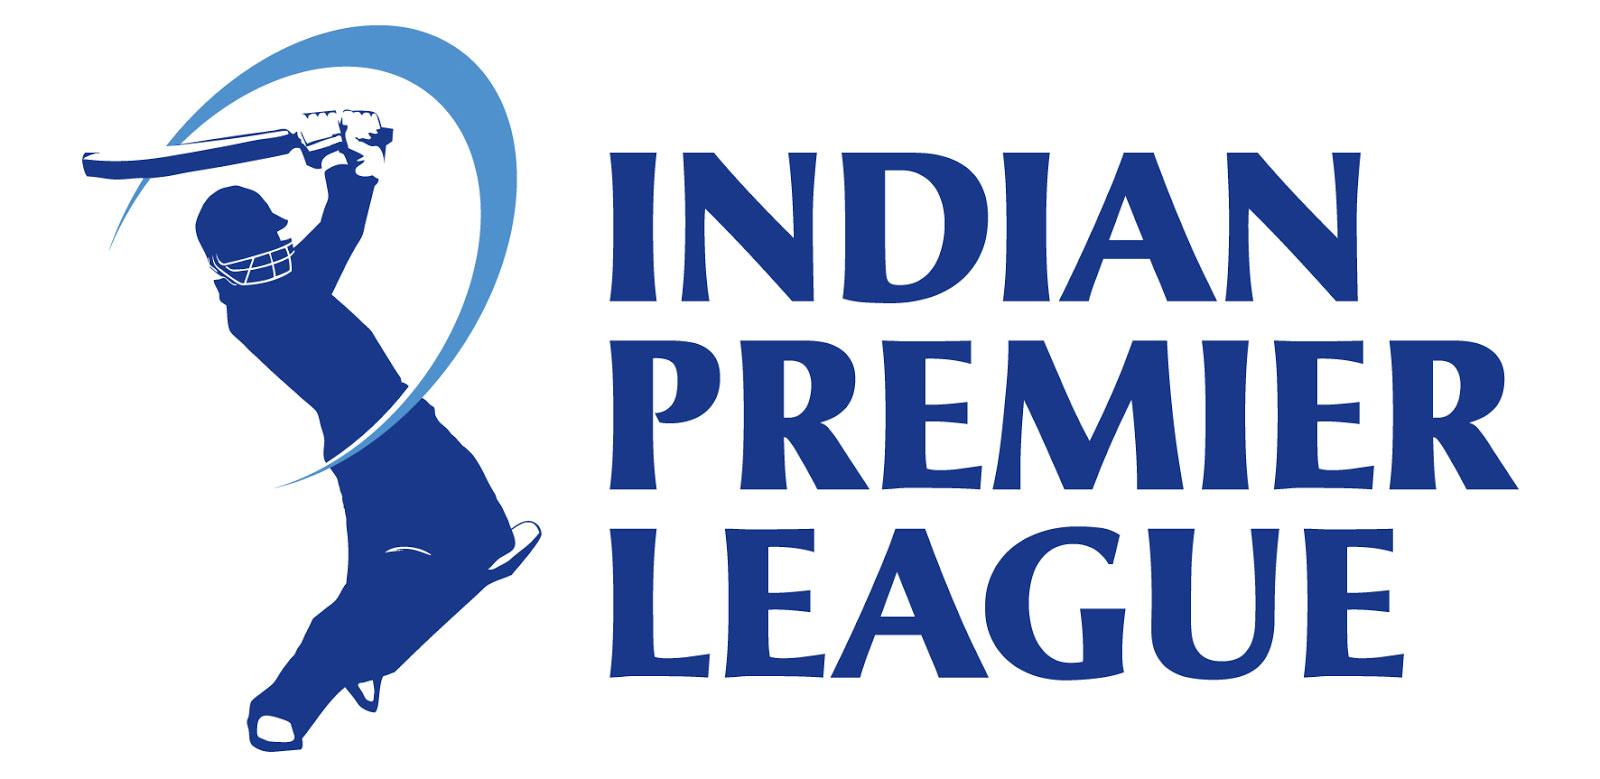 Cricket clipart ipl, Cricket ipl Transparent FREE for.